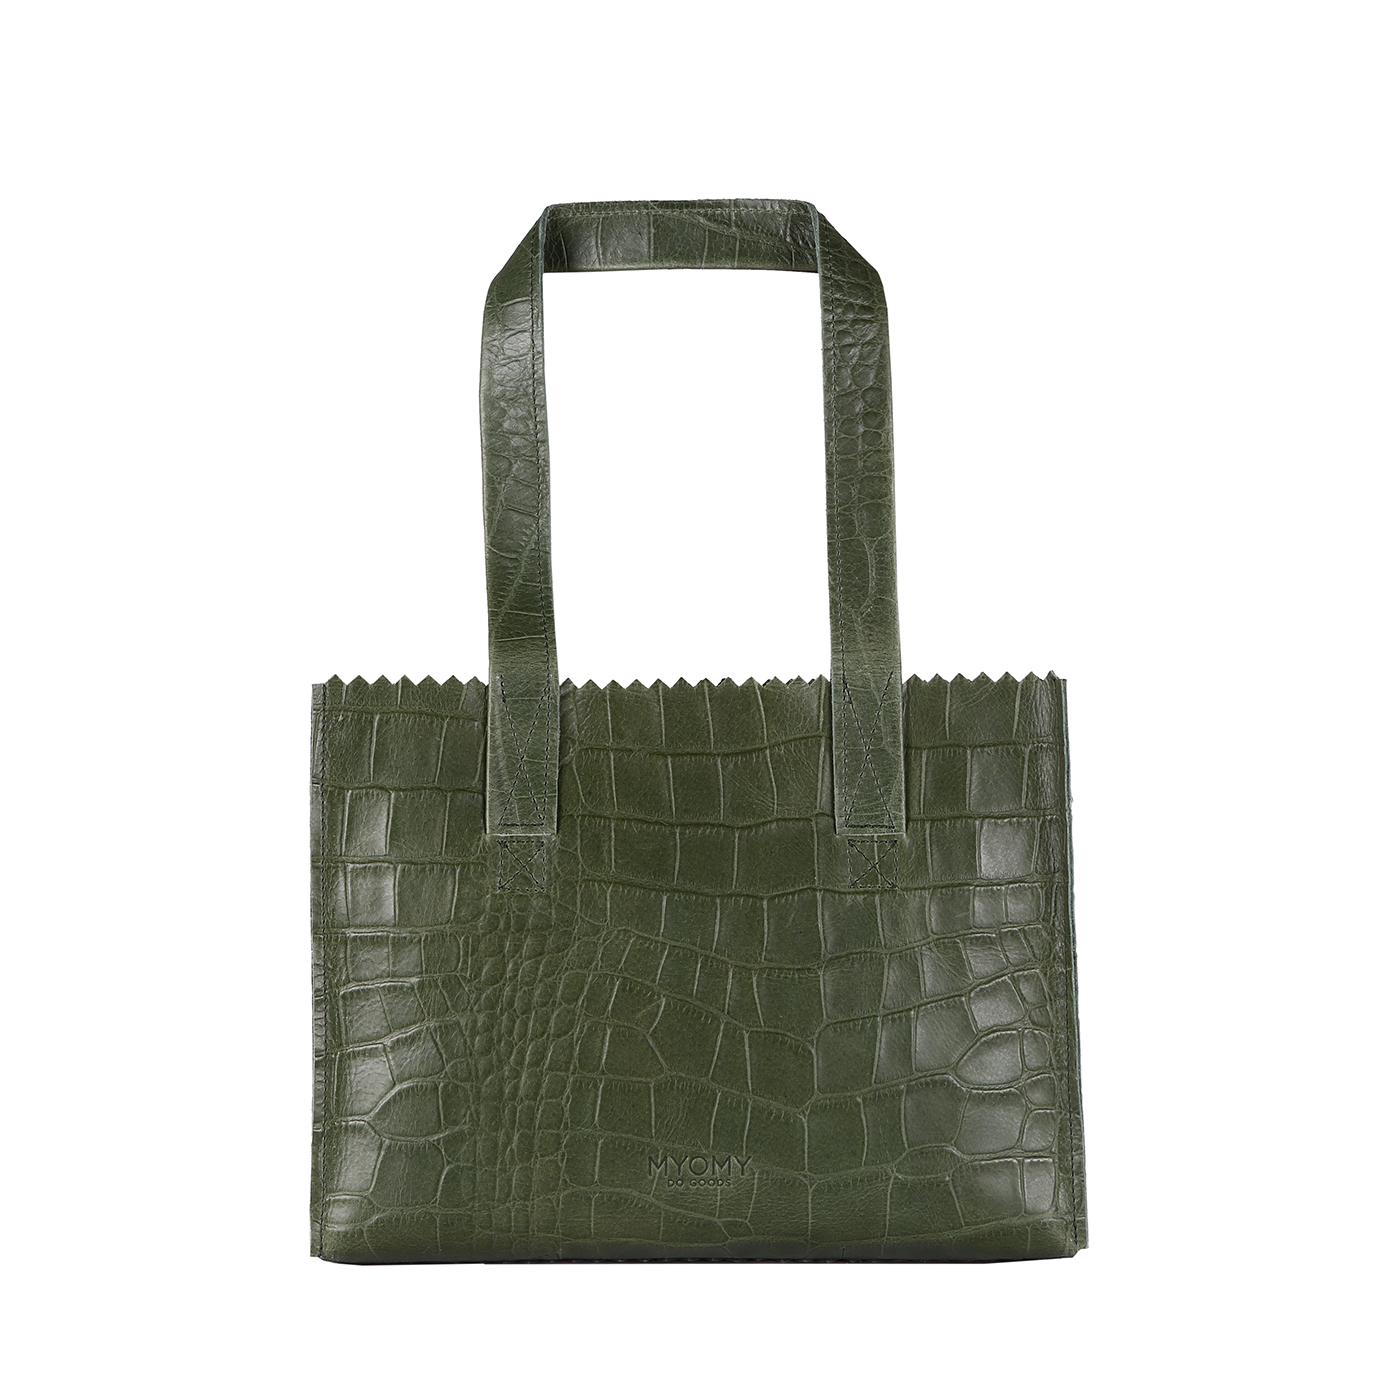 MY PAPER BAG Handbag – croco vetiver green